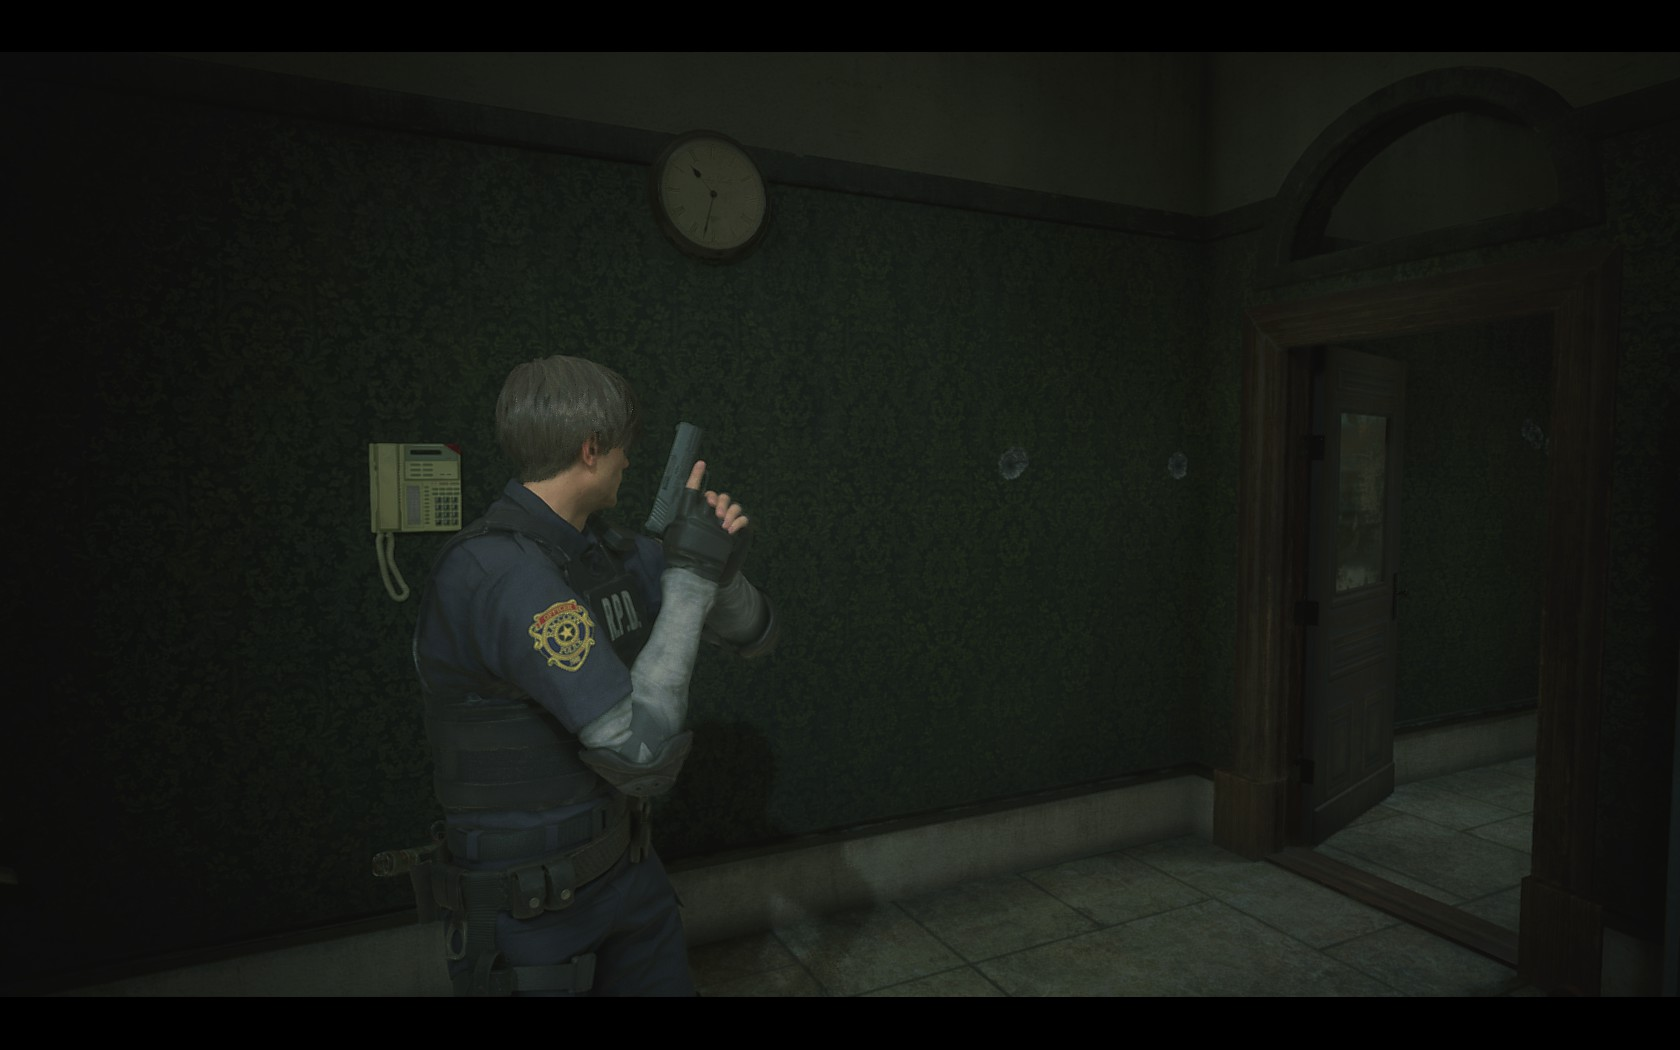 Glock 19 Mod - Resident Evil 2 Remake Mods | GameWatcher